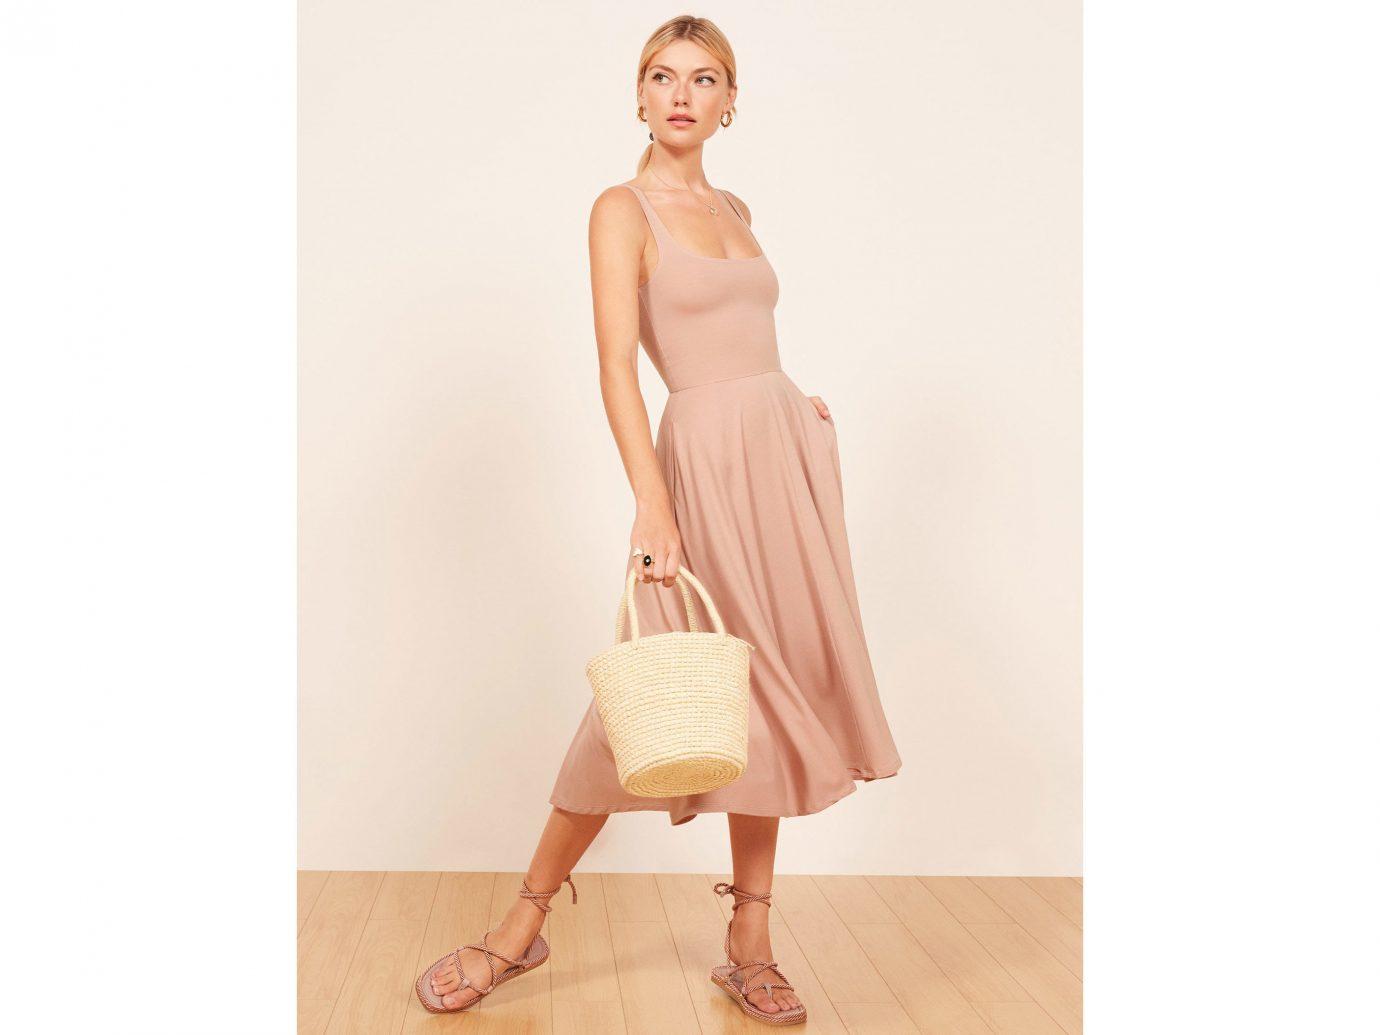 Style + Design Travel Shop wall clothing fashion model indoor shoulder dress shoe day dress peach supermodel beige cocktail dress joint neck waist posing tan